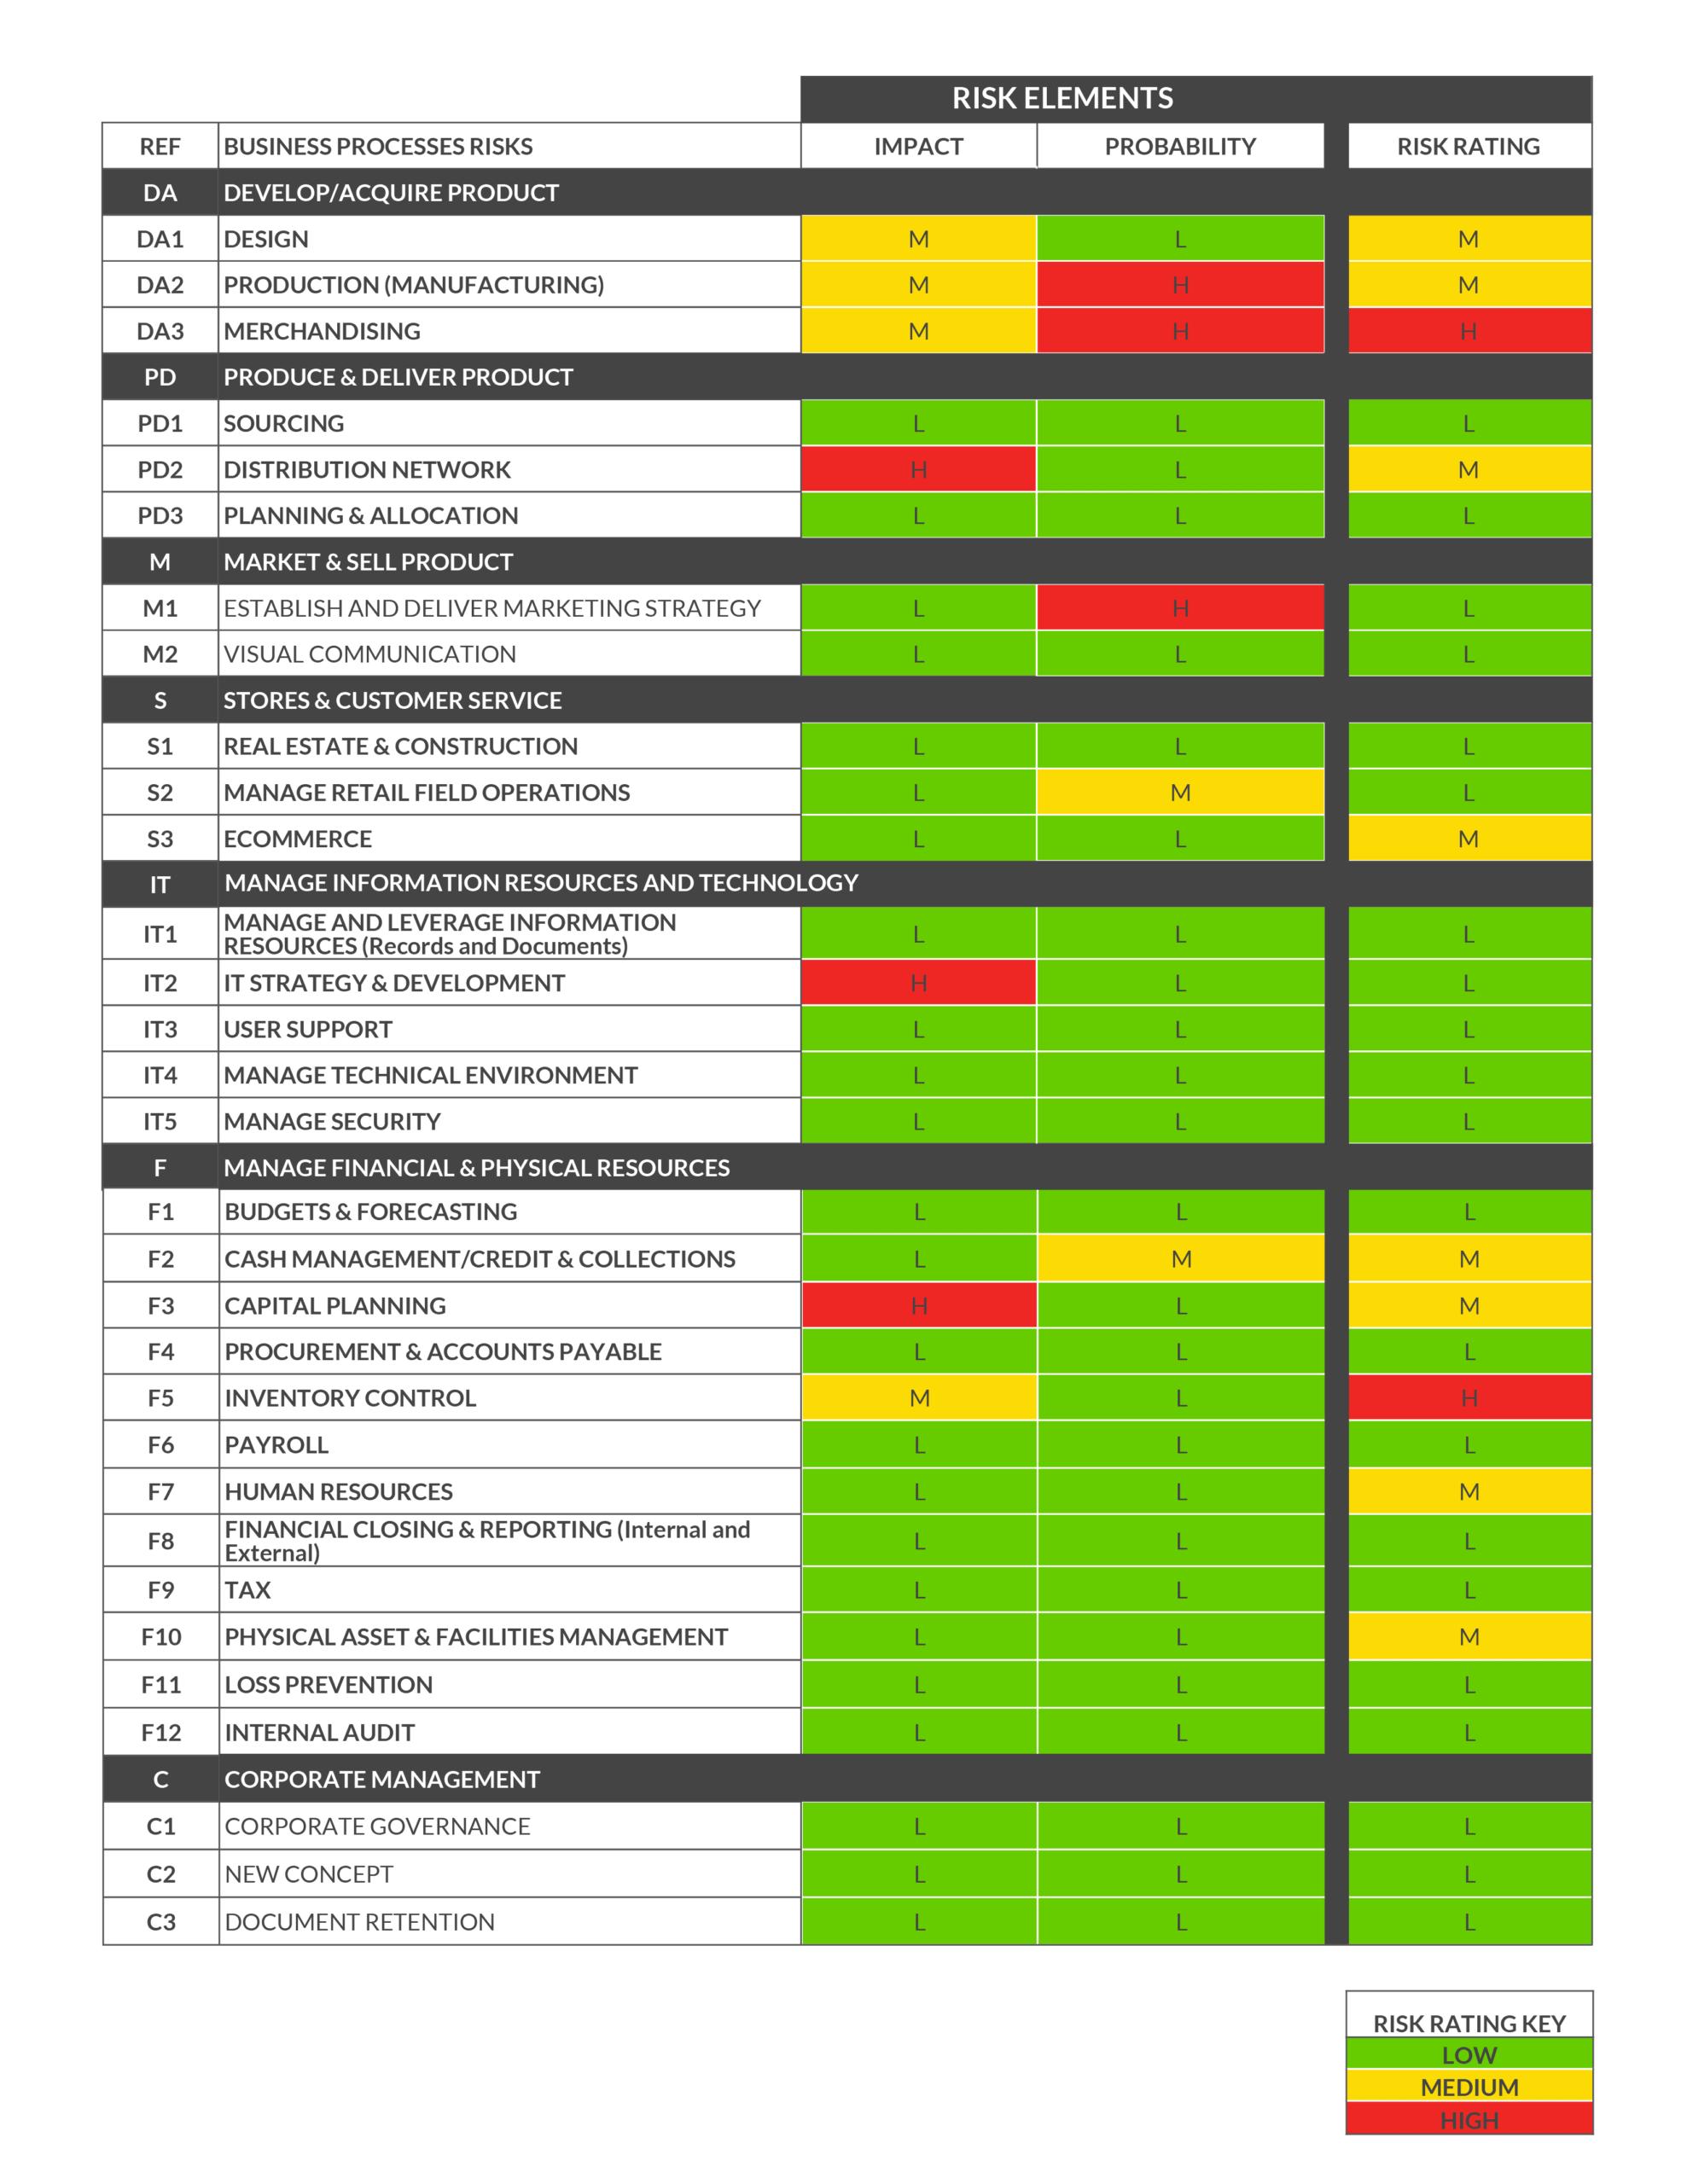 Enterprise Risk Management Report Template Within Enterprise Risk Management Report Template